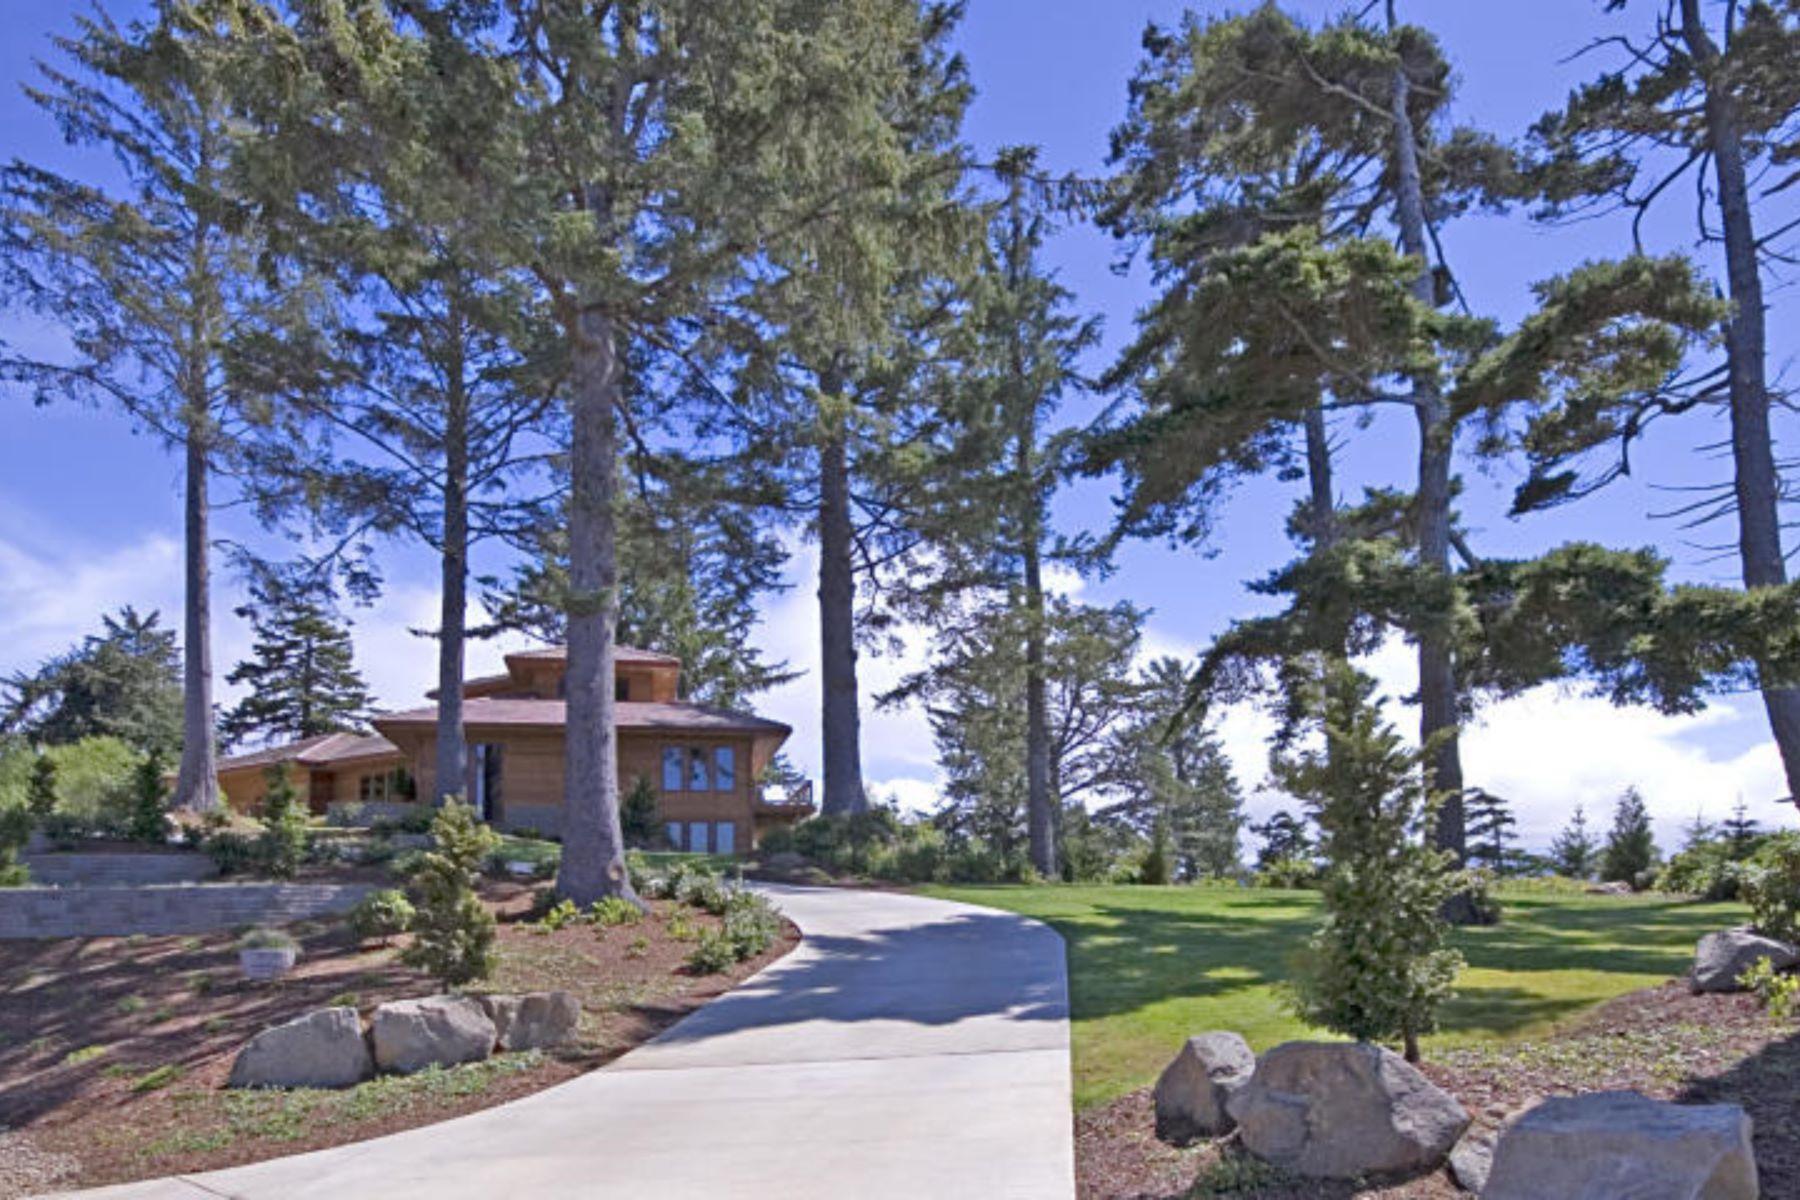 Single Family Homes για την Πώληση στο 835 NW Highland Cir Waldport, OR 97394 Waldport, Ορεγκον 97394 Ηνωμένες Πολιτείες